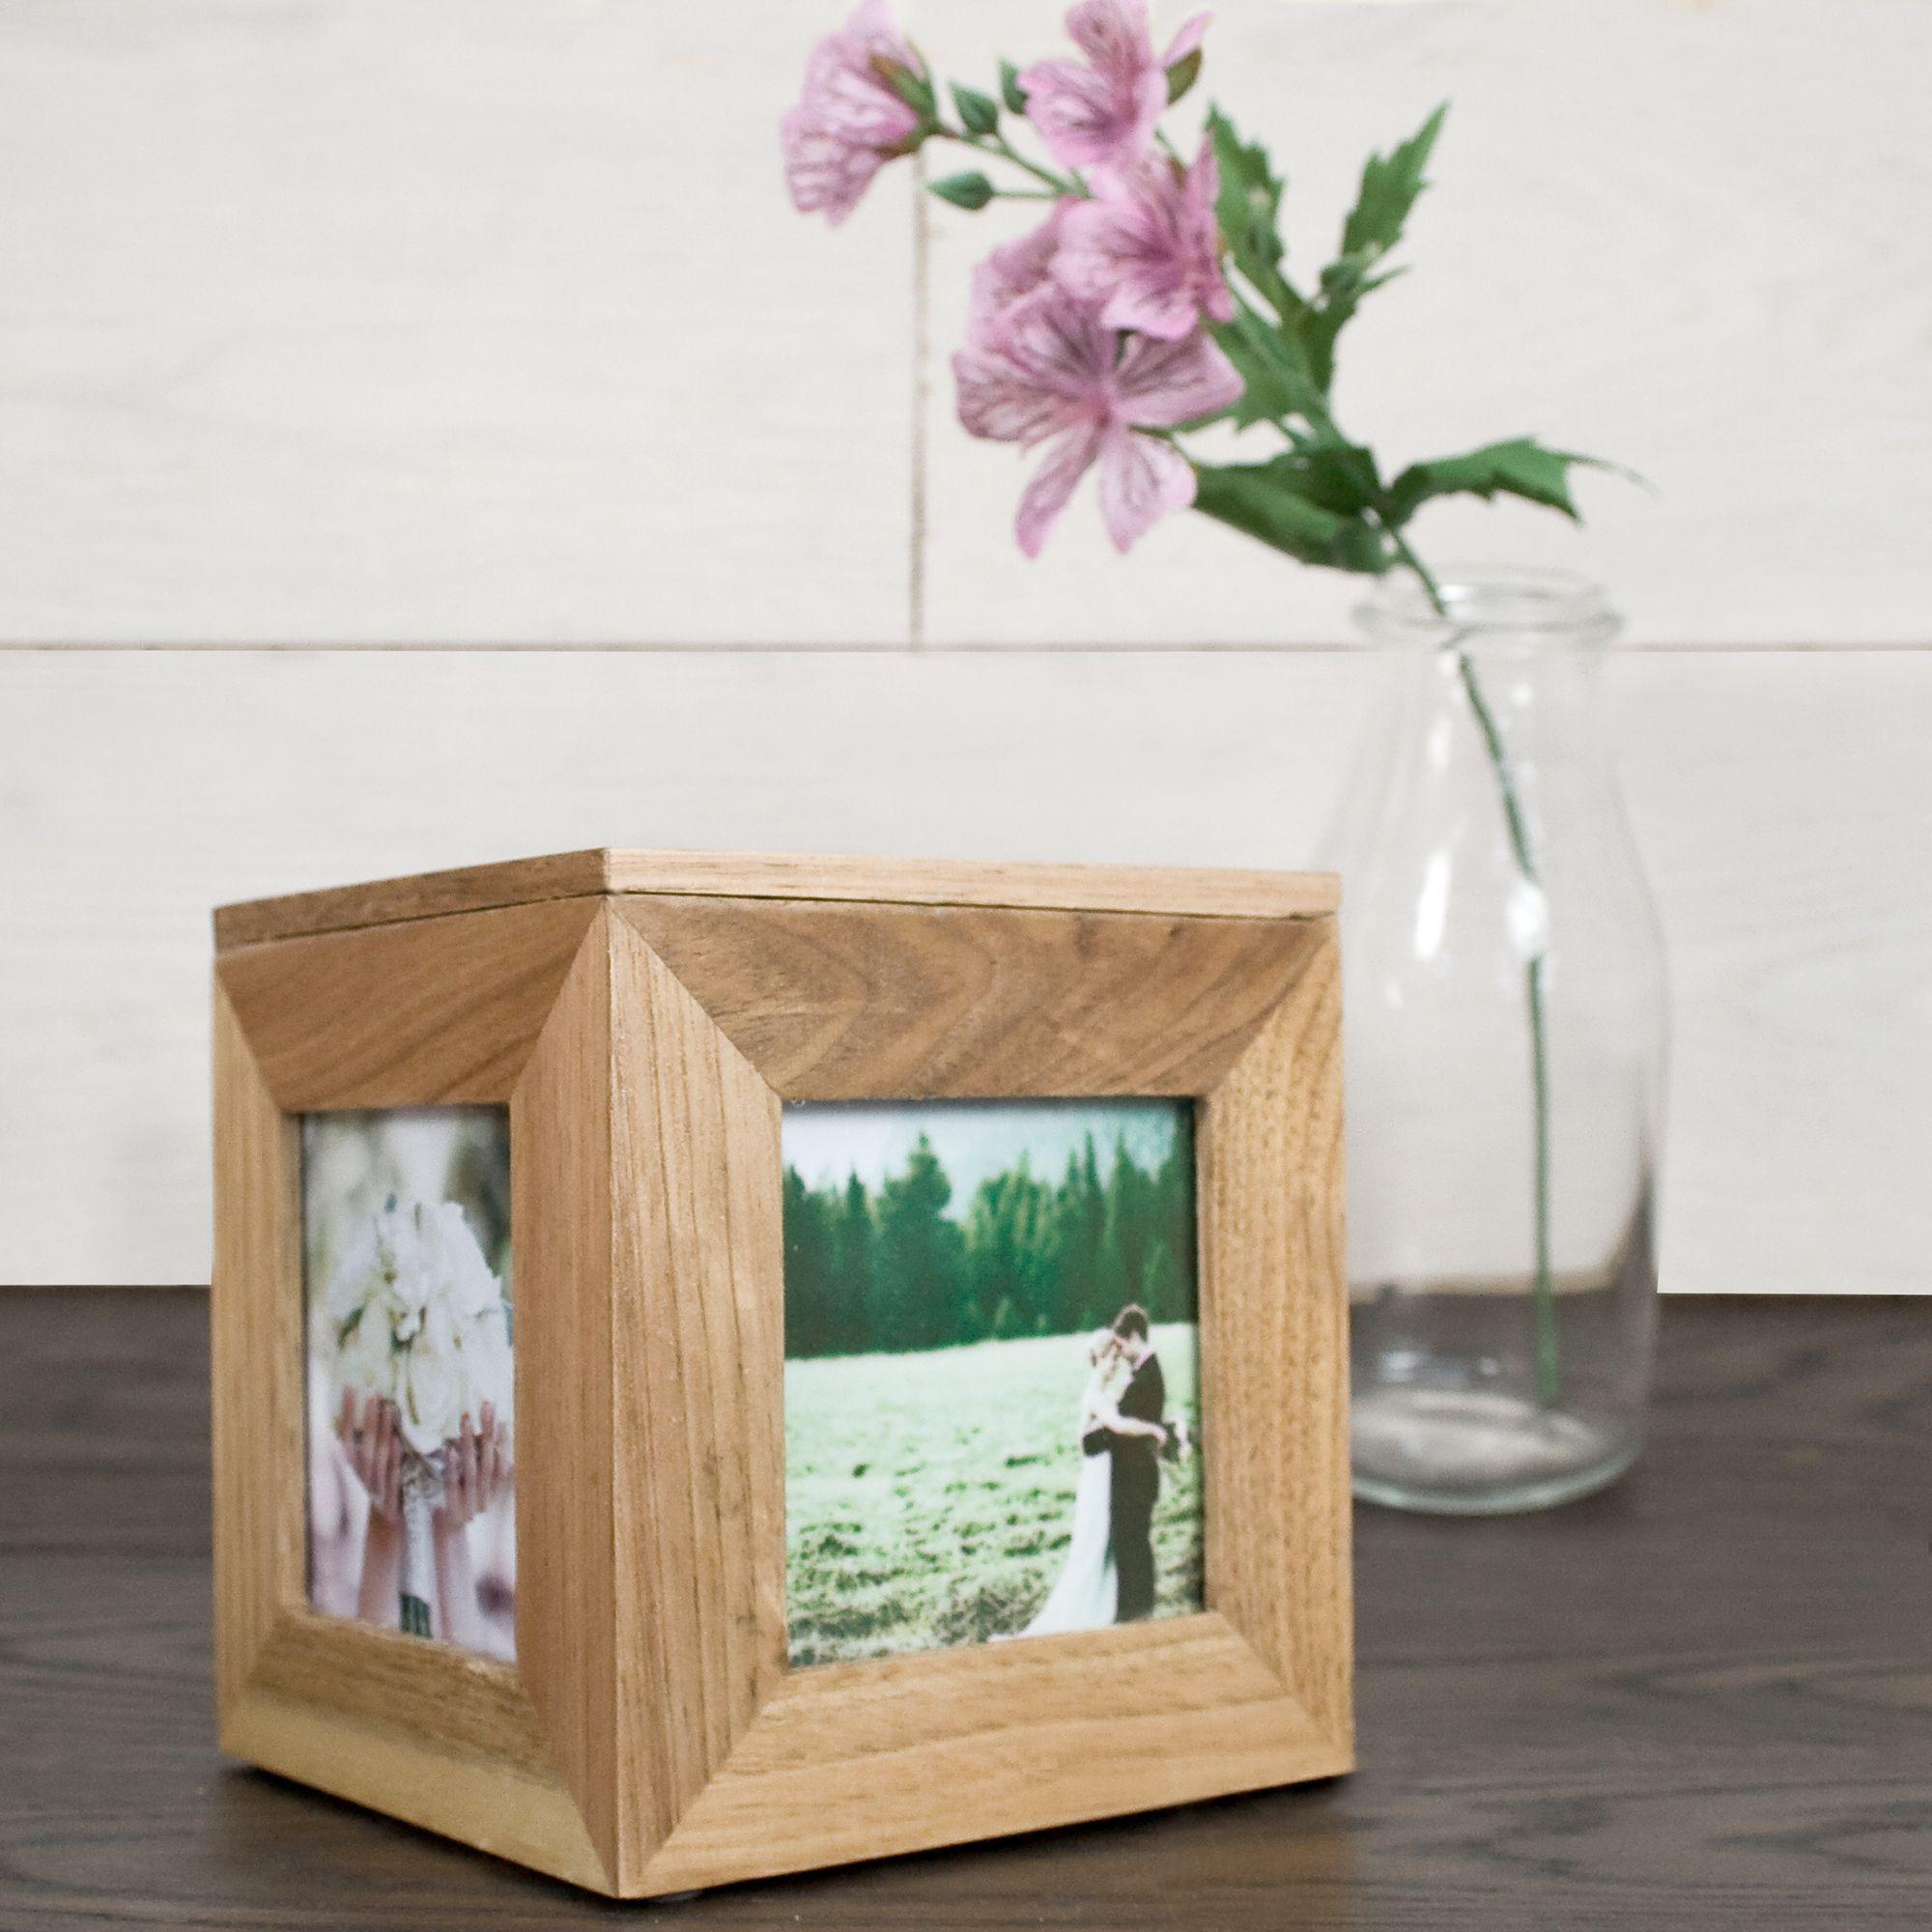 Neptune Giftware Natural Oak Wooden 5 Picture Photo Photo cube keepsake box